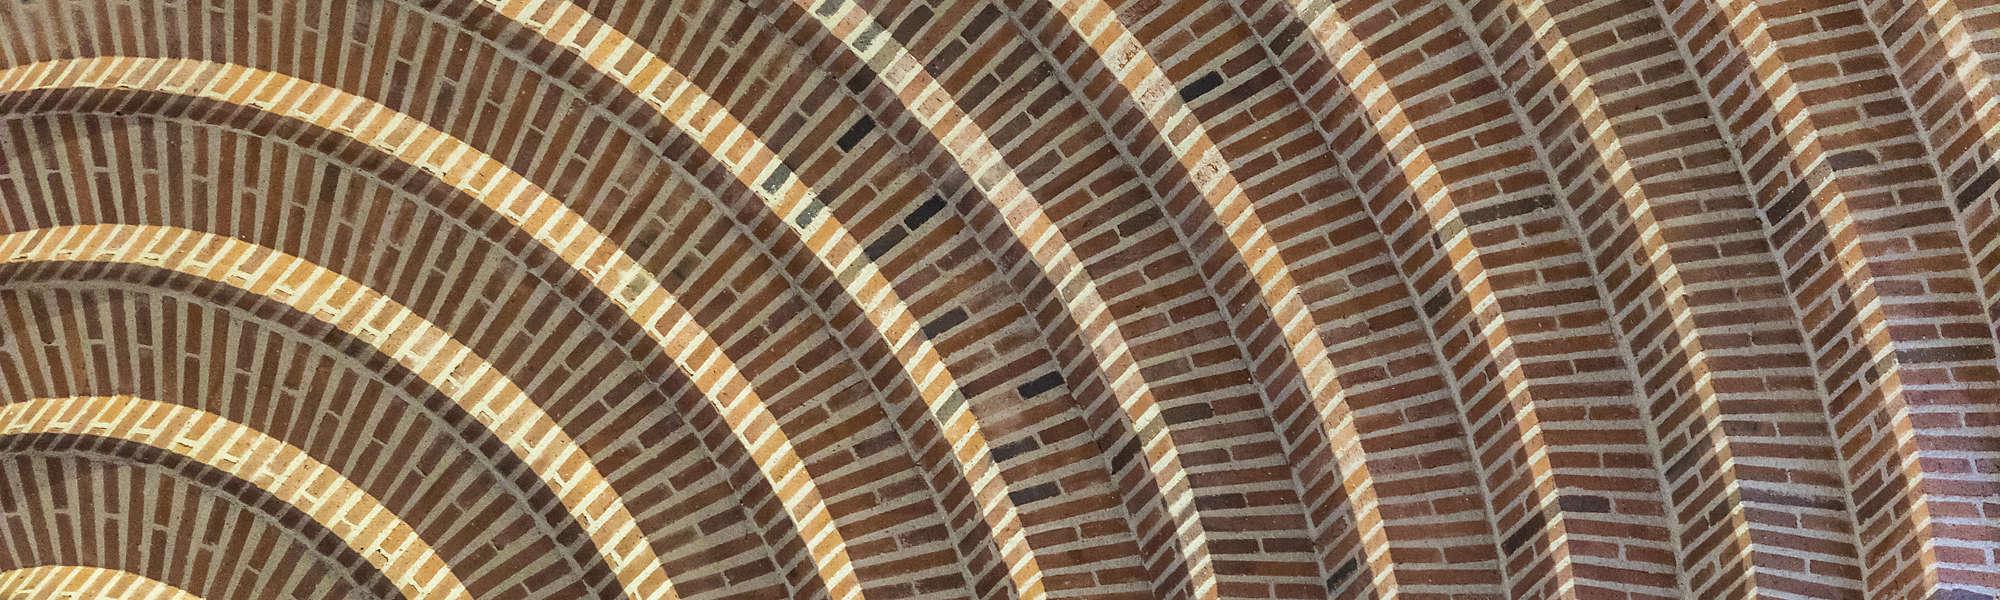 Church brick spiral circle pattern